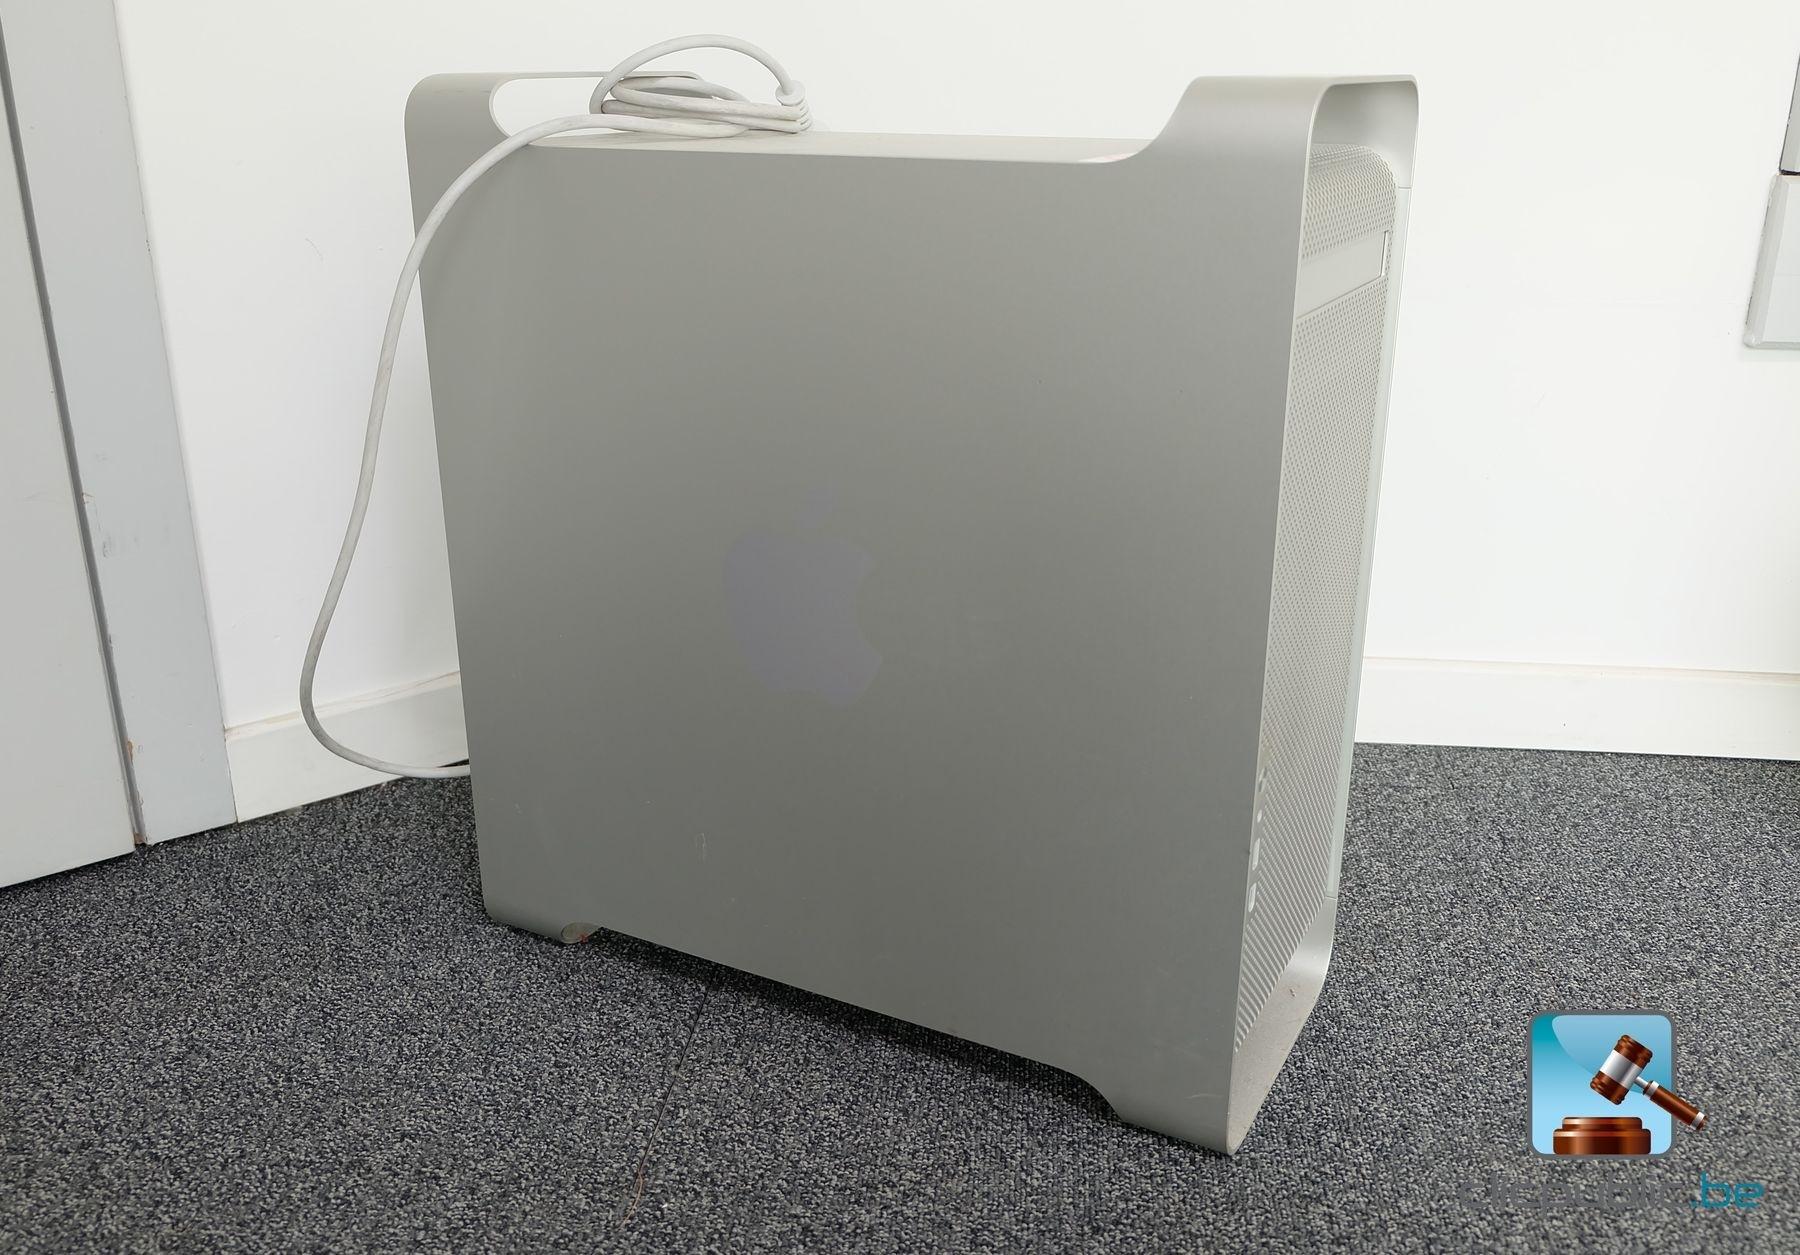 ordinateur de bureau apple power mac g5 ref 64 vendre. Black Bedroom Furniture Sets. Home Design Ideas